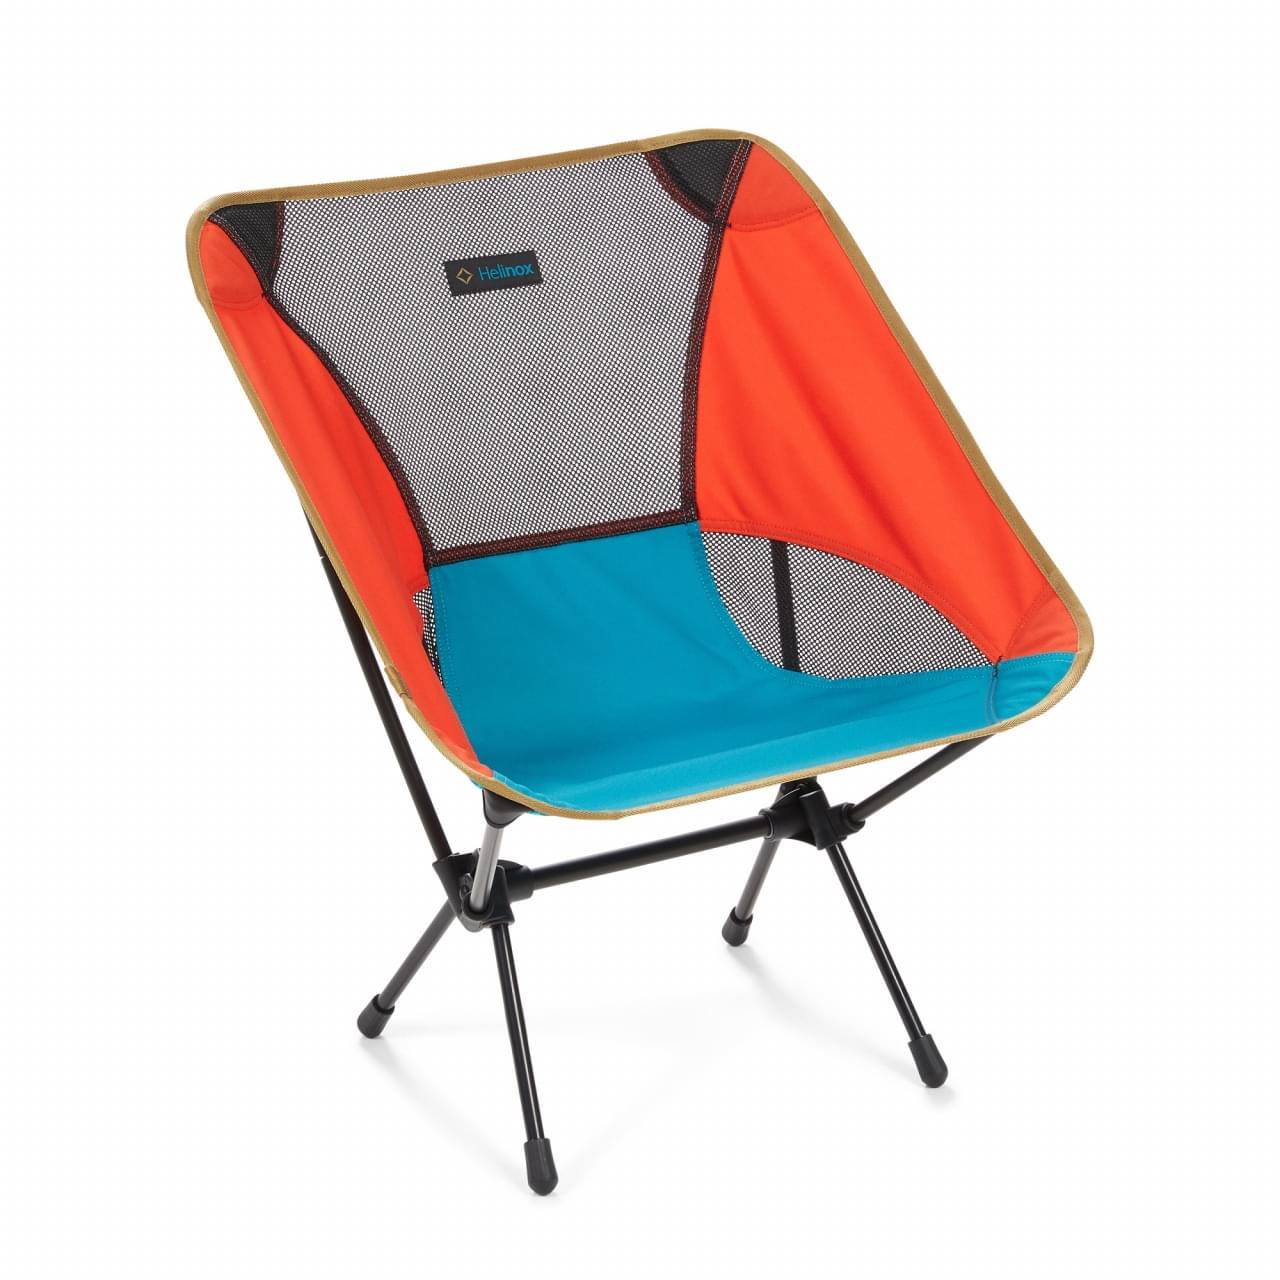 Helinox Chair One Block Lichtgewicht Stoel - Multicolor